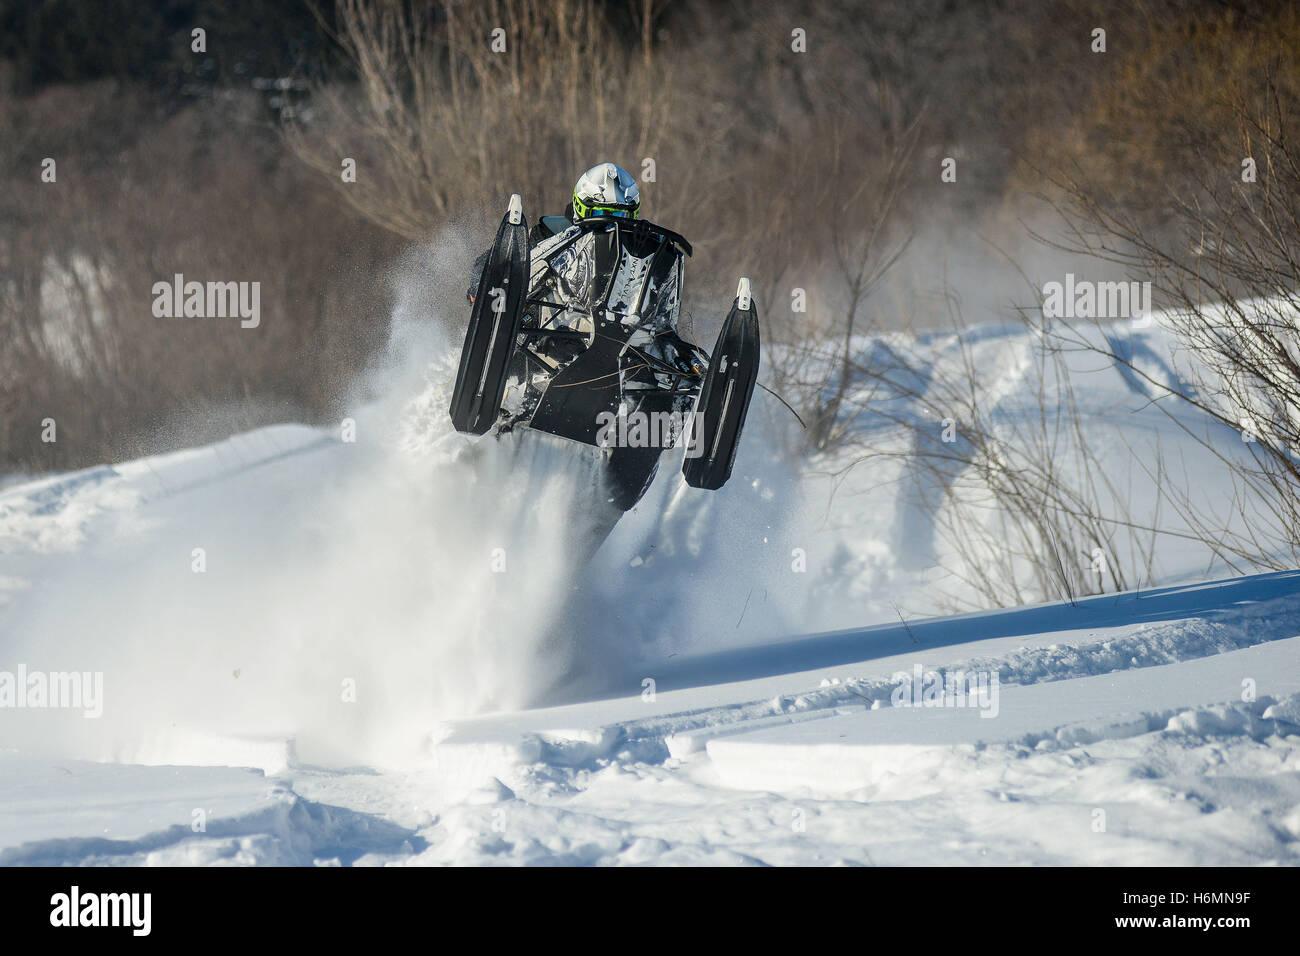 Man on snowmobile in winter mountain - Stock Image